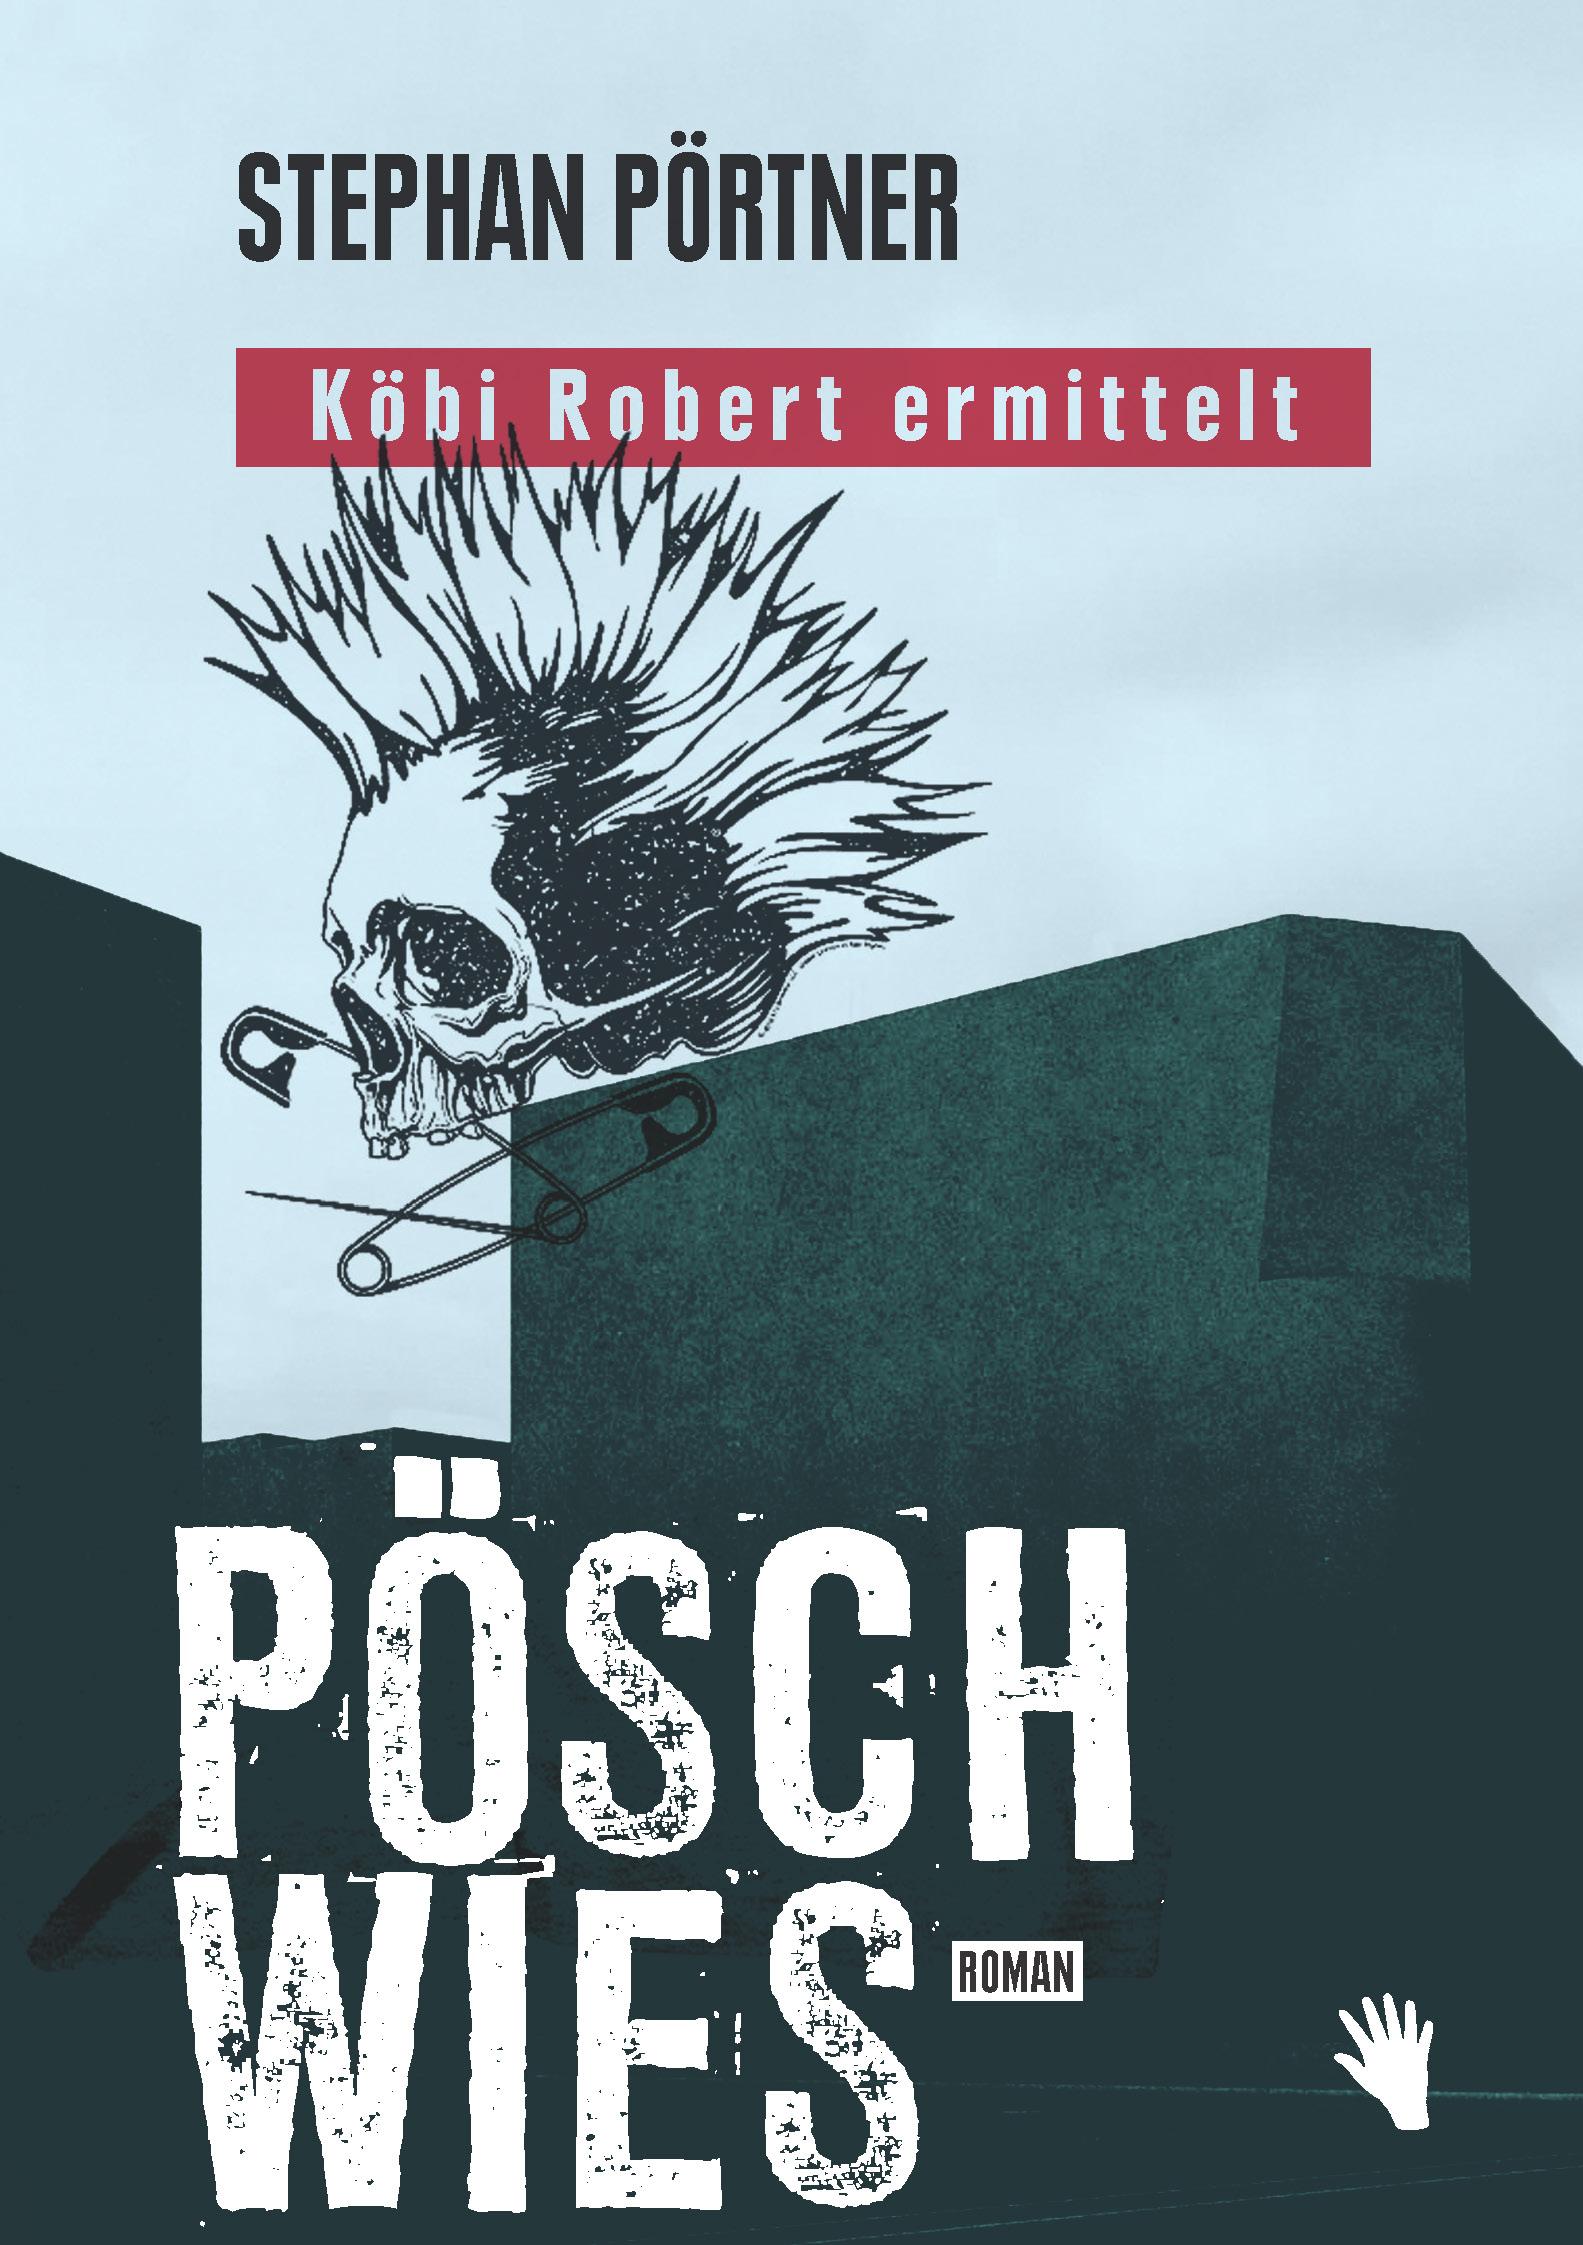 poertner poeschwies cover